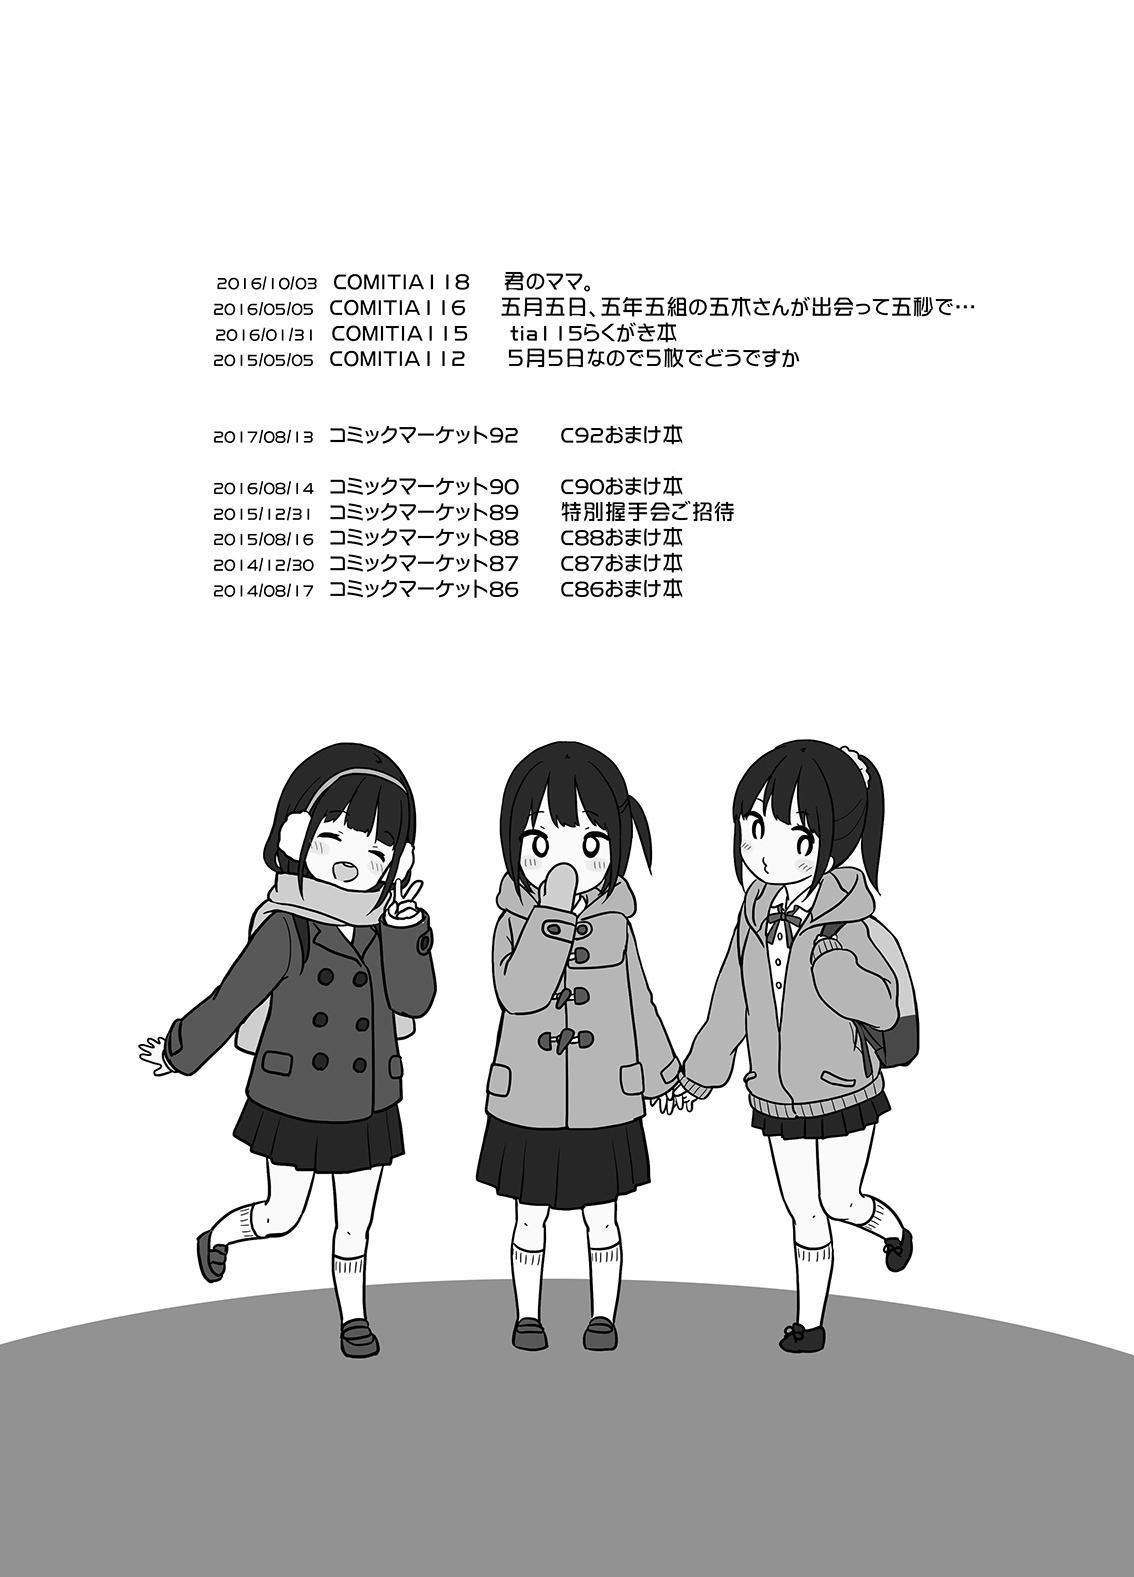 MeltdoWNCOmetおまけ本まとめ 2